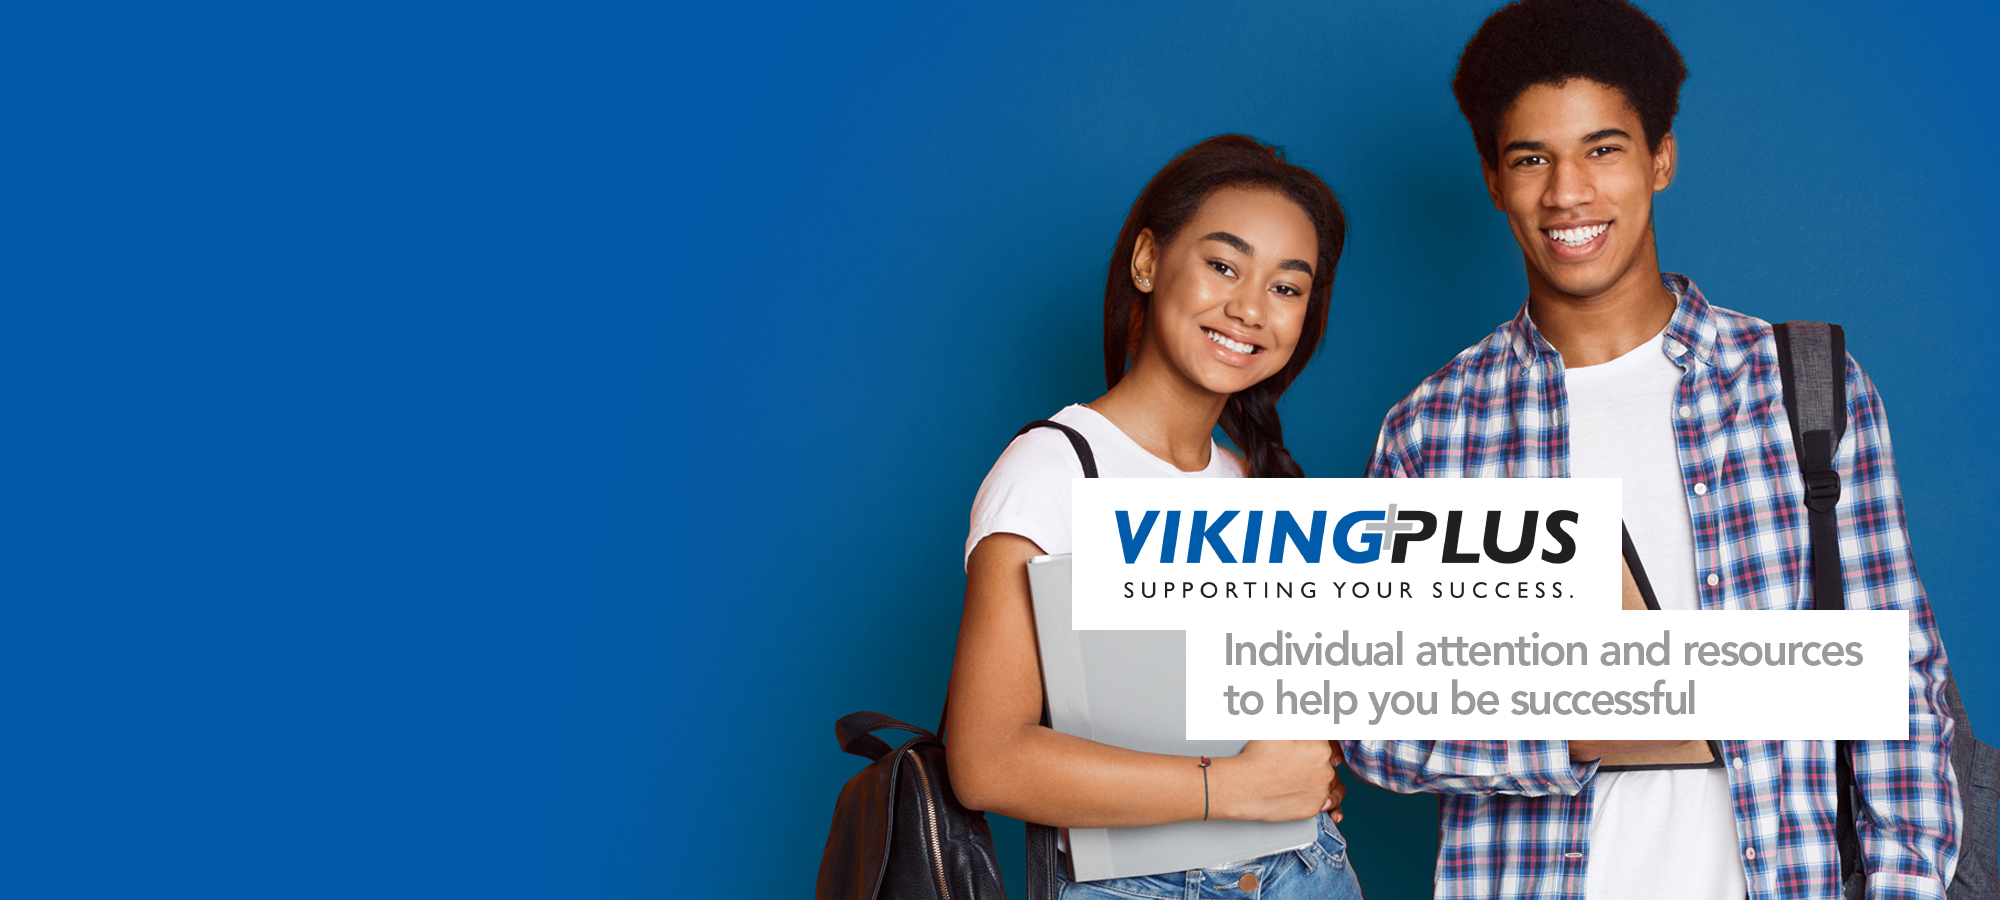 Vikingplus